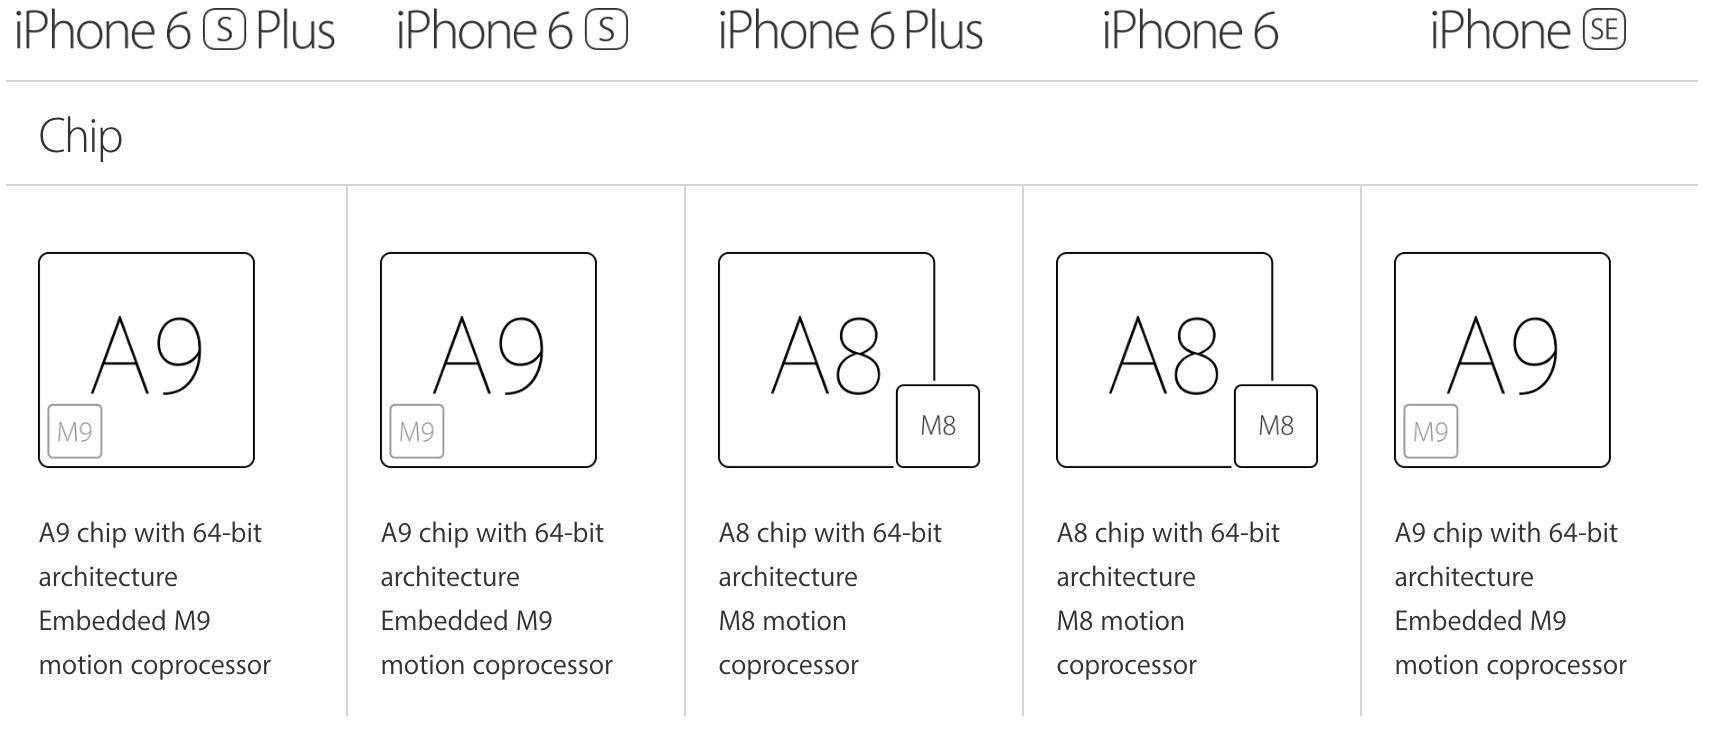 Pilih iPhone 6 Atau iPhone SE?